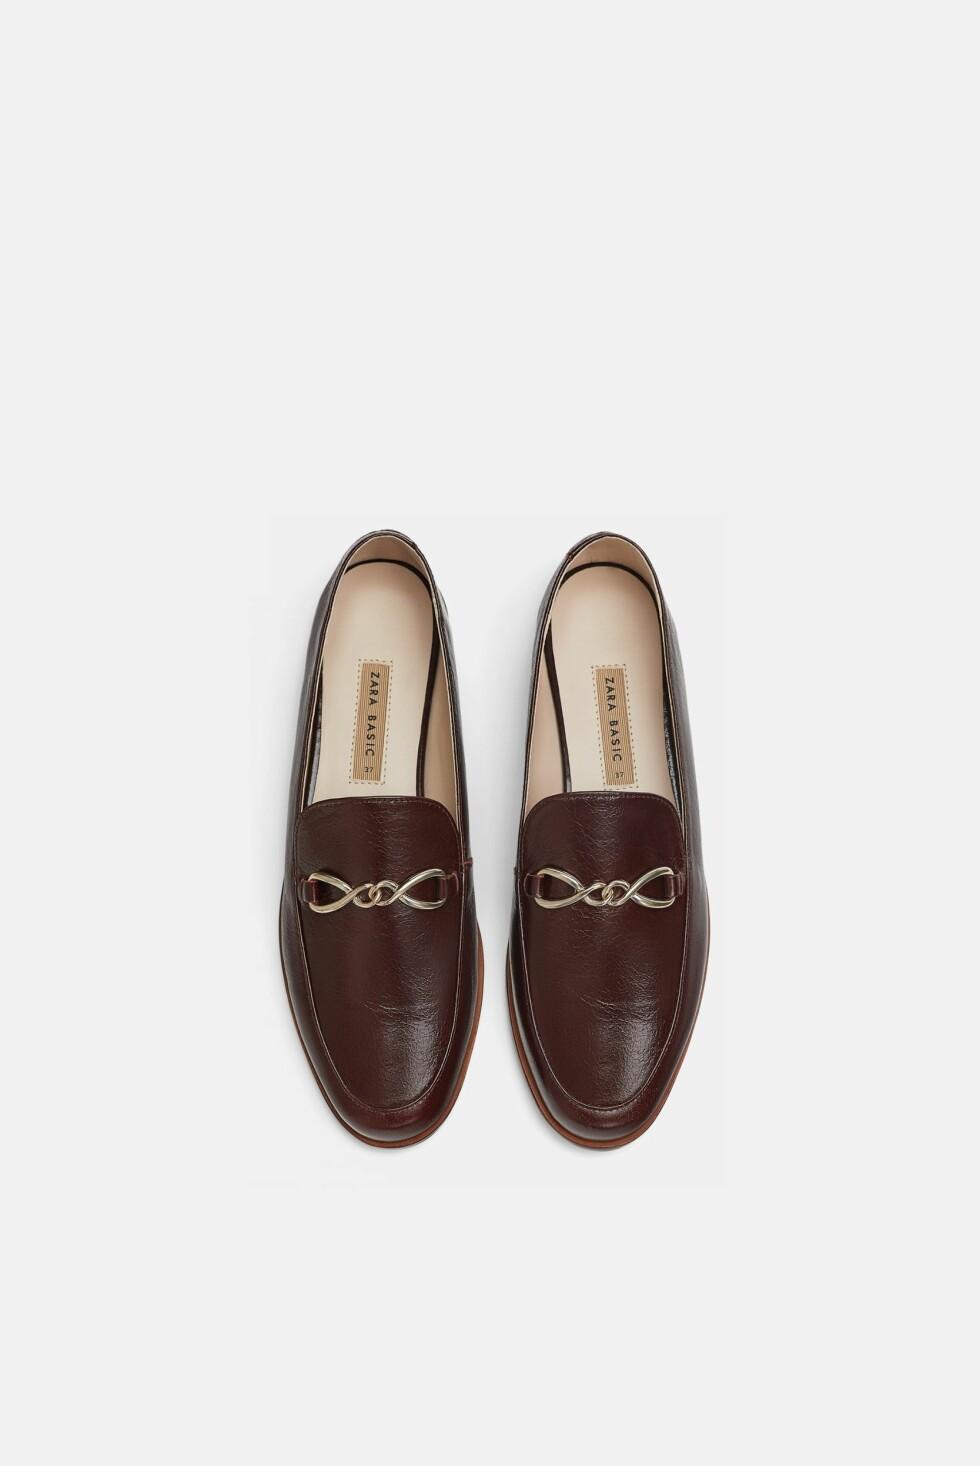 Sko fra Zara |600,-| https://www.zara.com/no/no/mokasin-i-skinn-p16922301.html?v1=6449830&v2=1074625